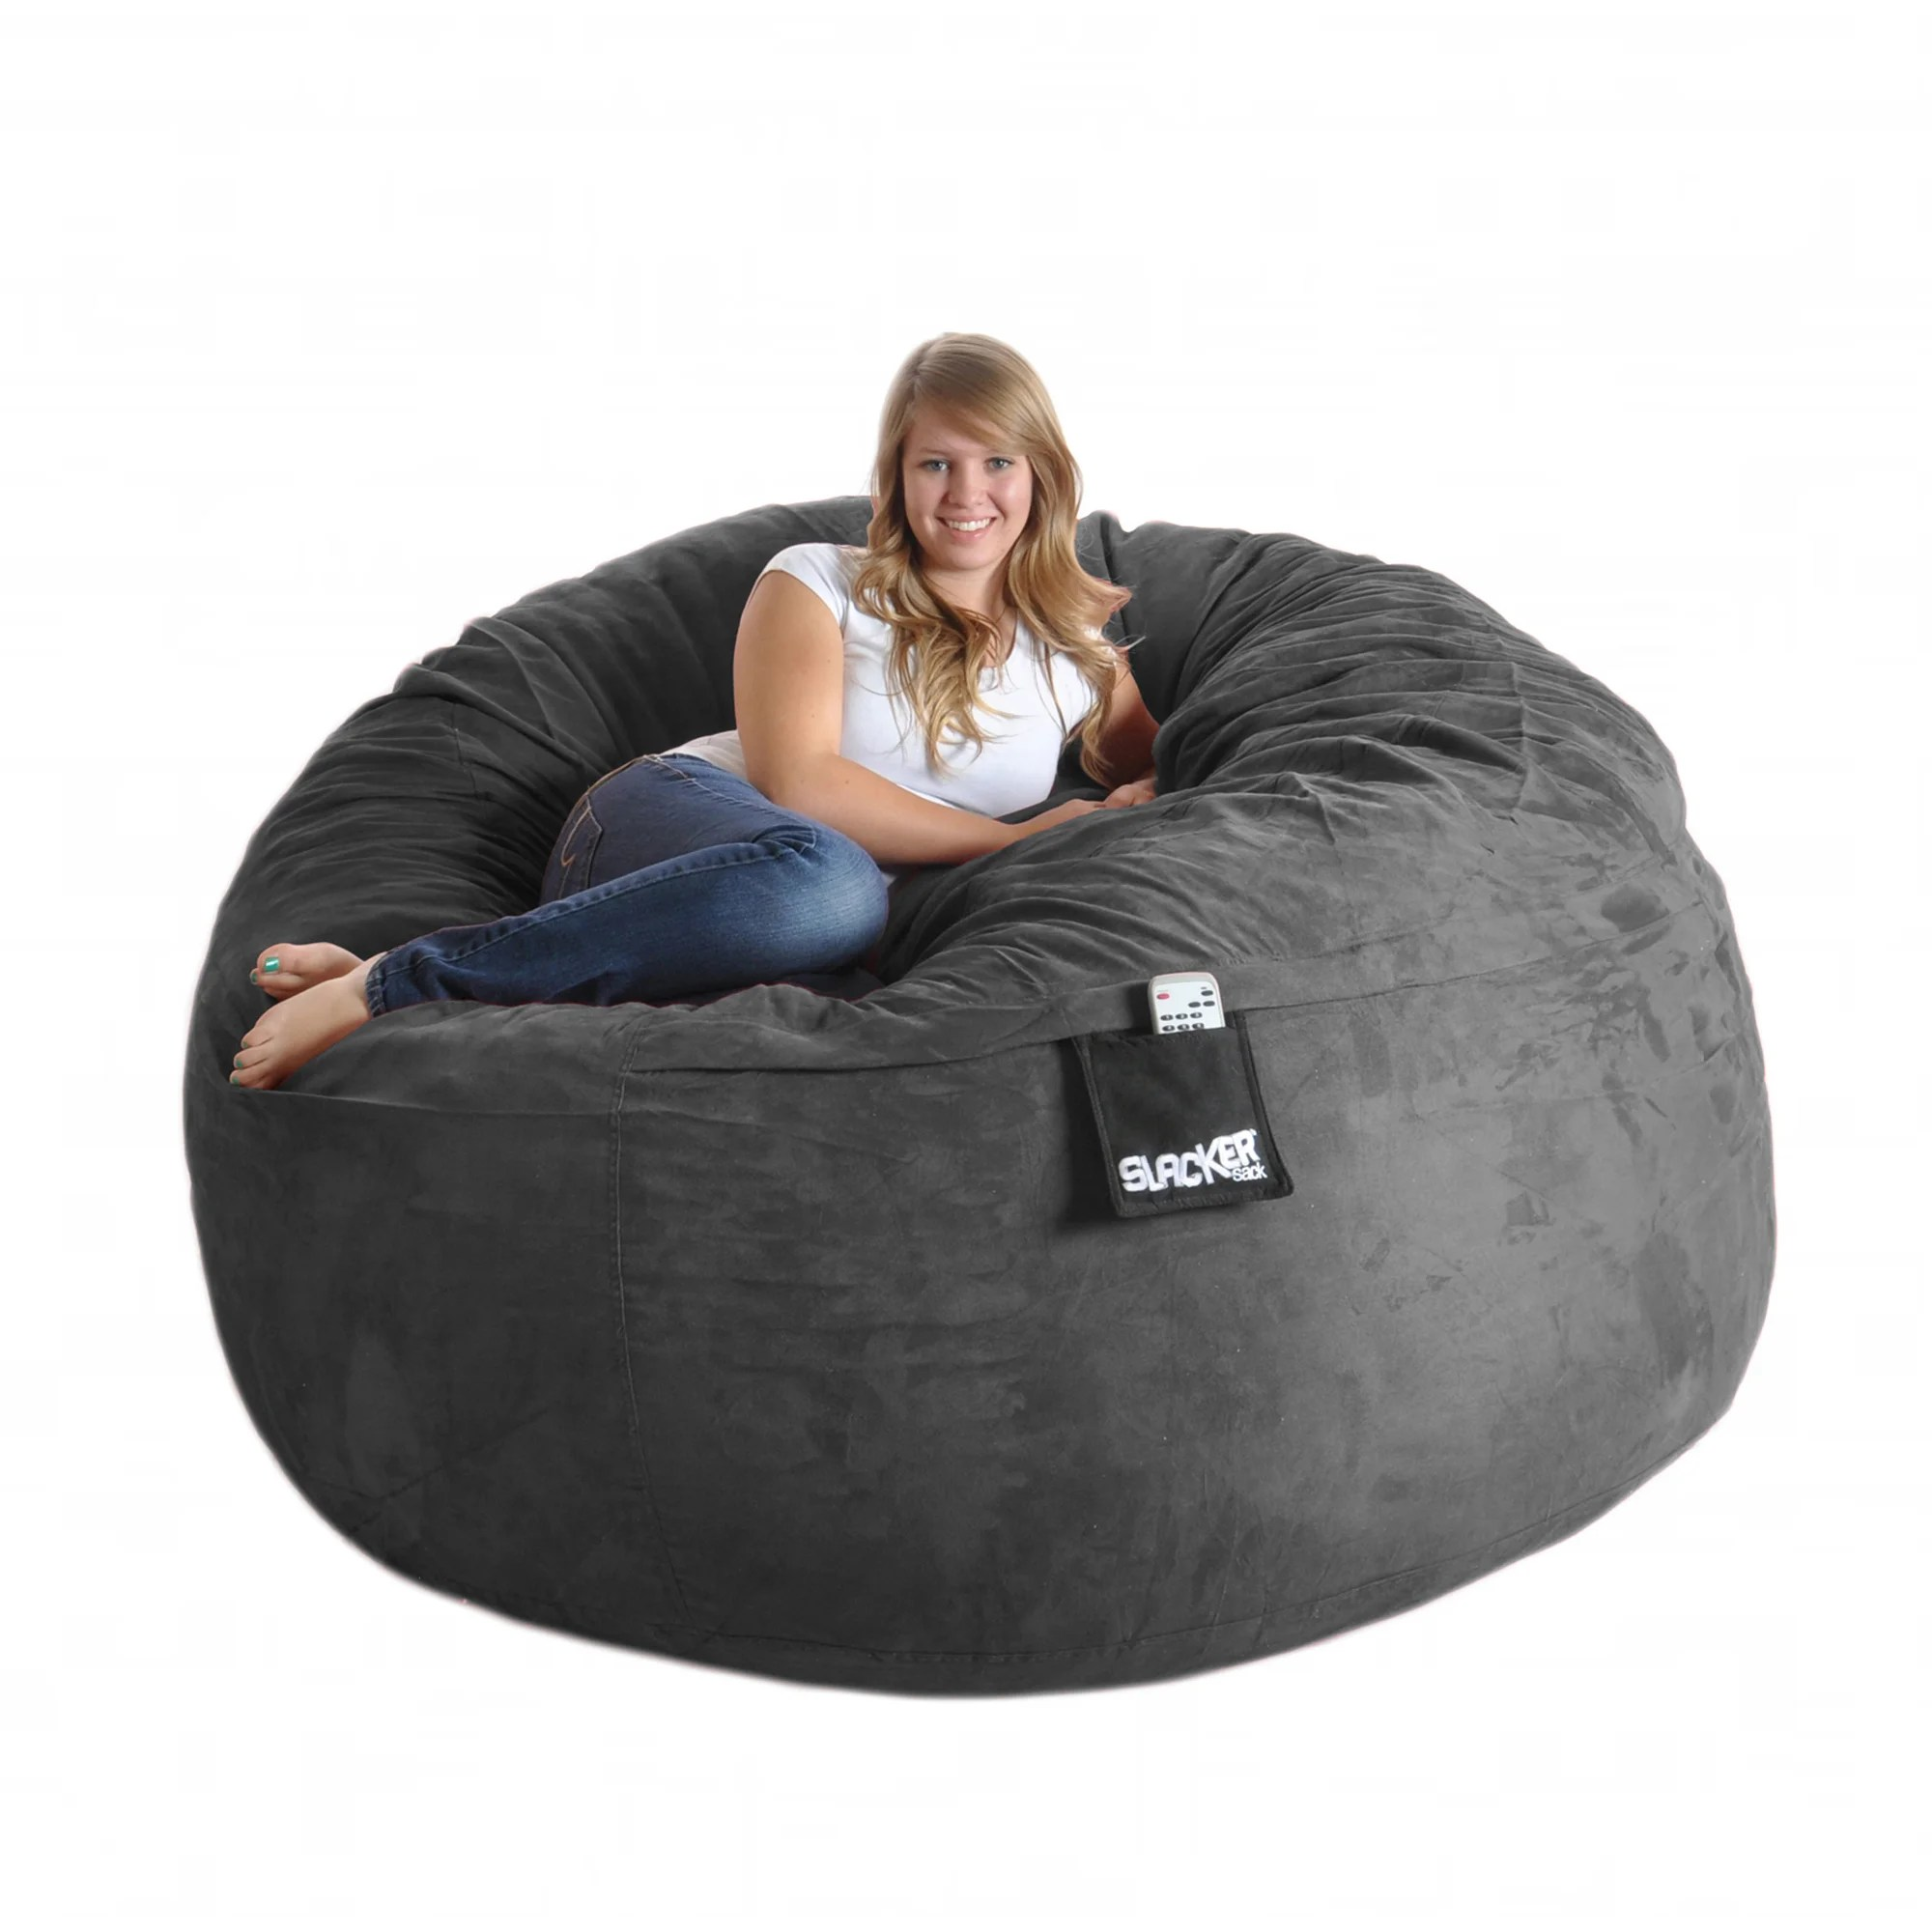 6 foot bean bag chair garden recliner covers uk shop slacker sack round microsuede and foam free